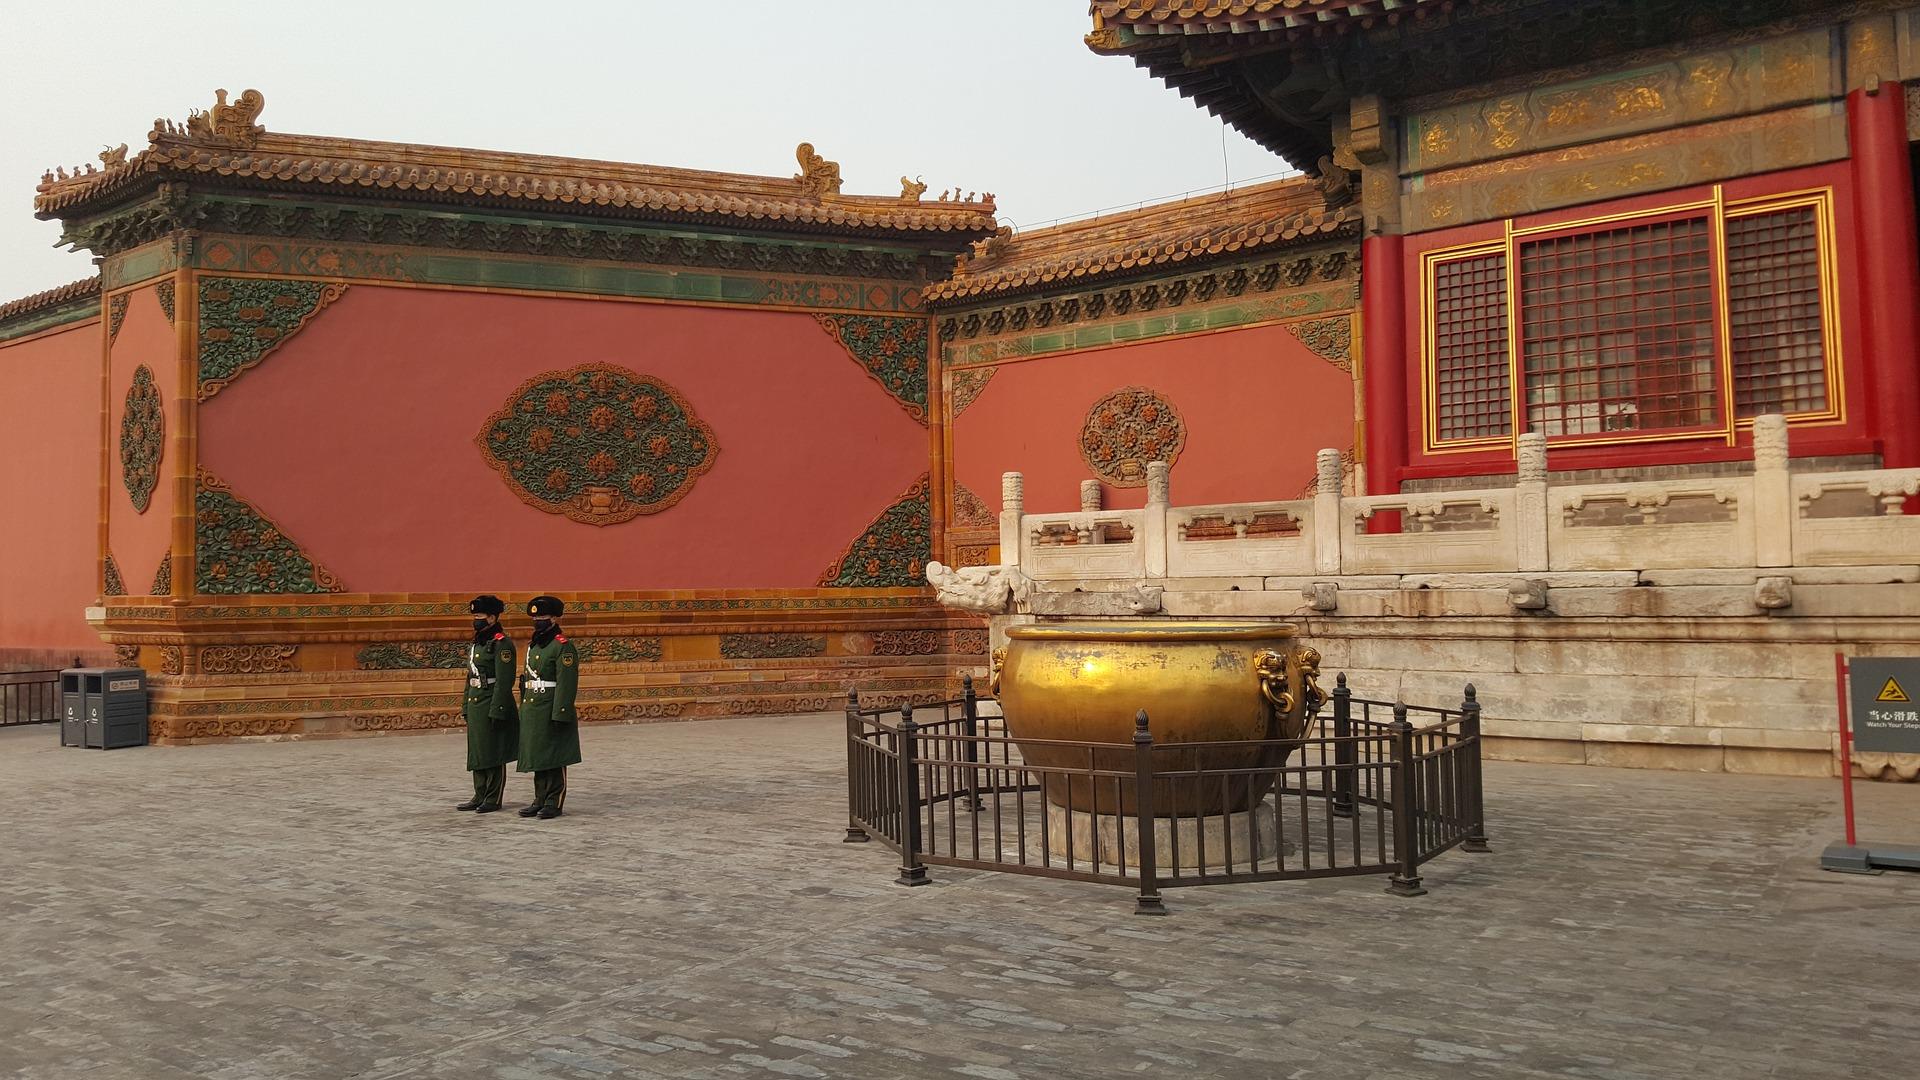 Pekín ciudad imperial